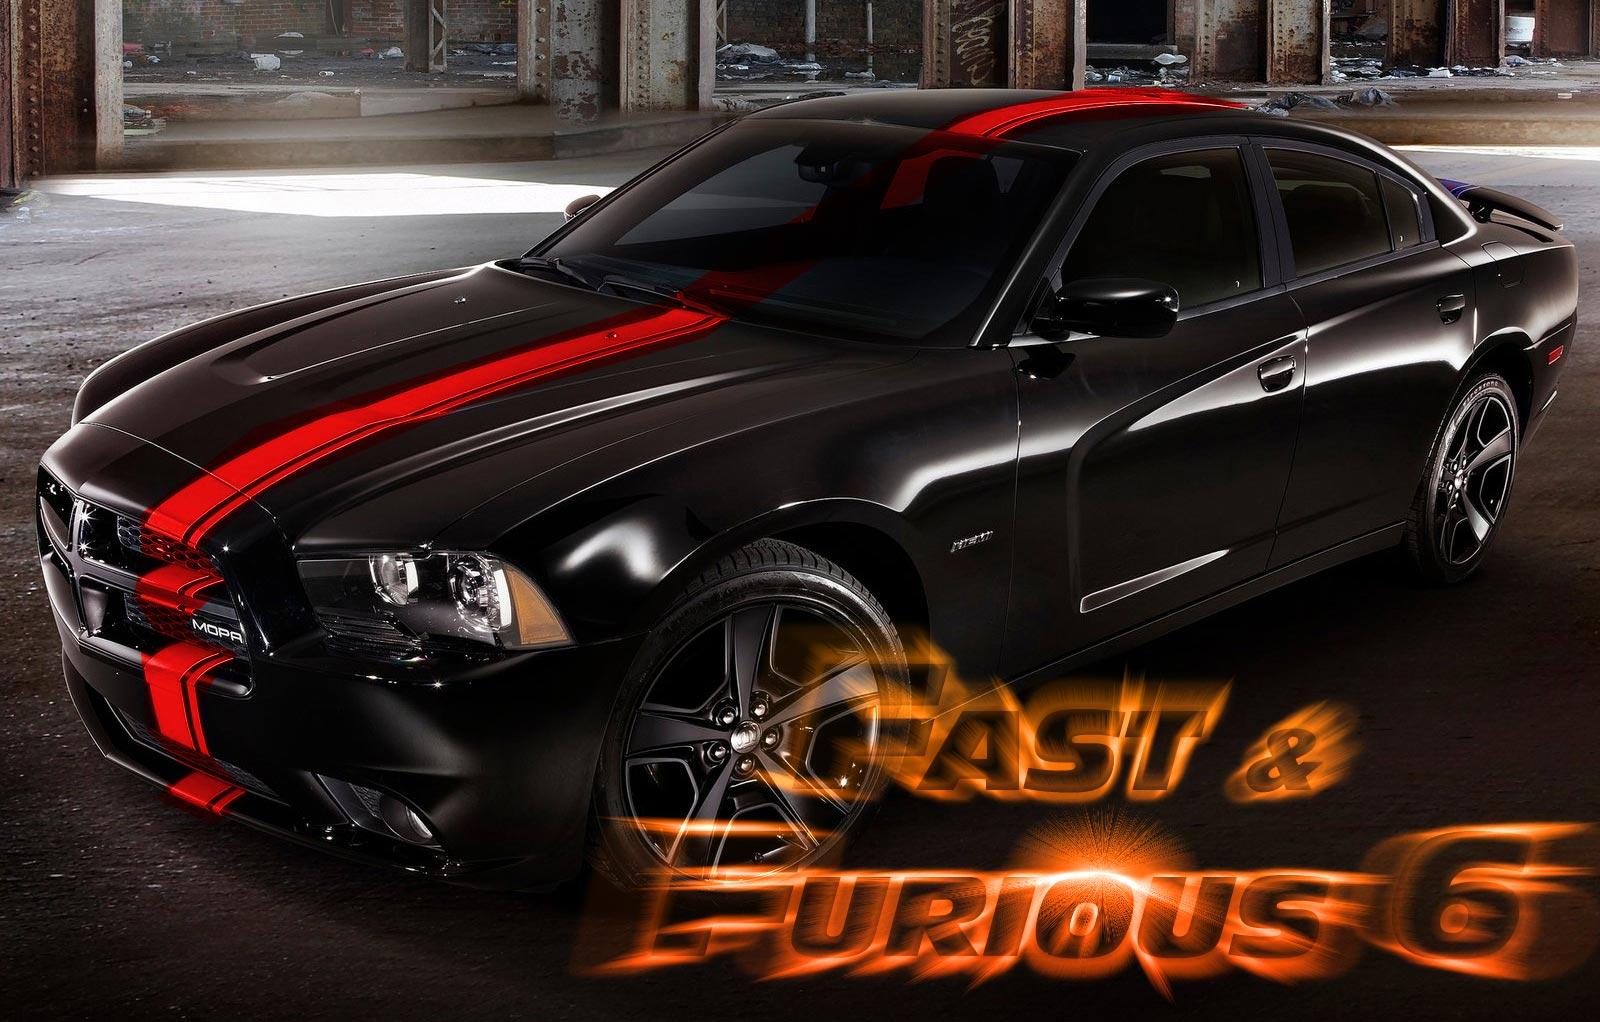 Description Fast and Furious 6 Wallpaper is a hi res Wallpaper for pc 1600x1022